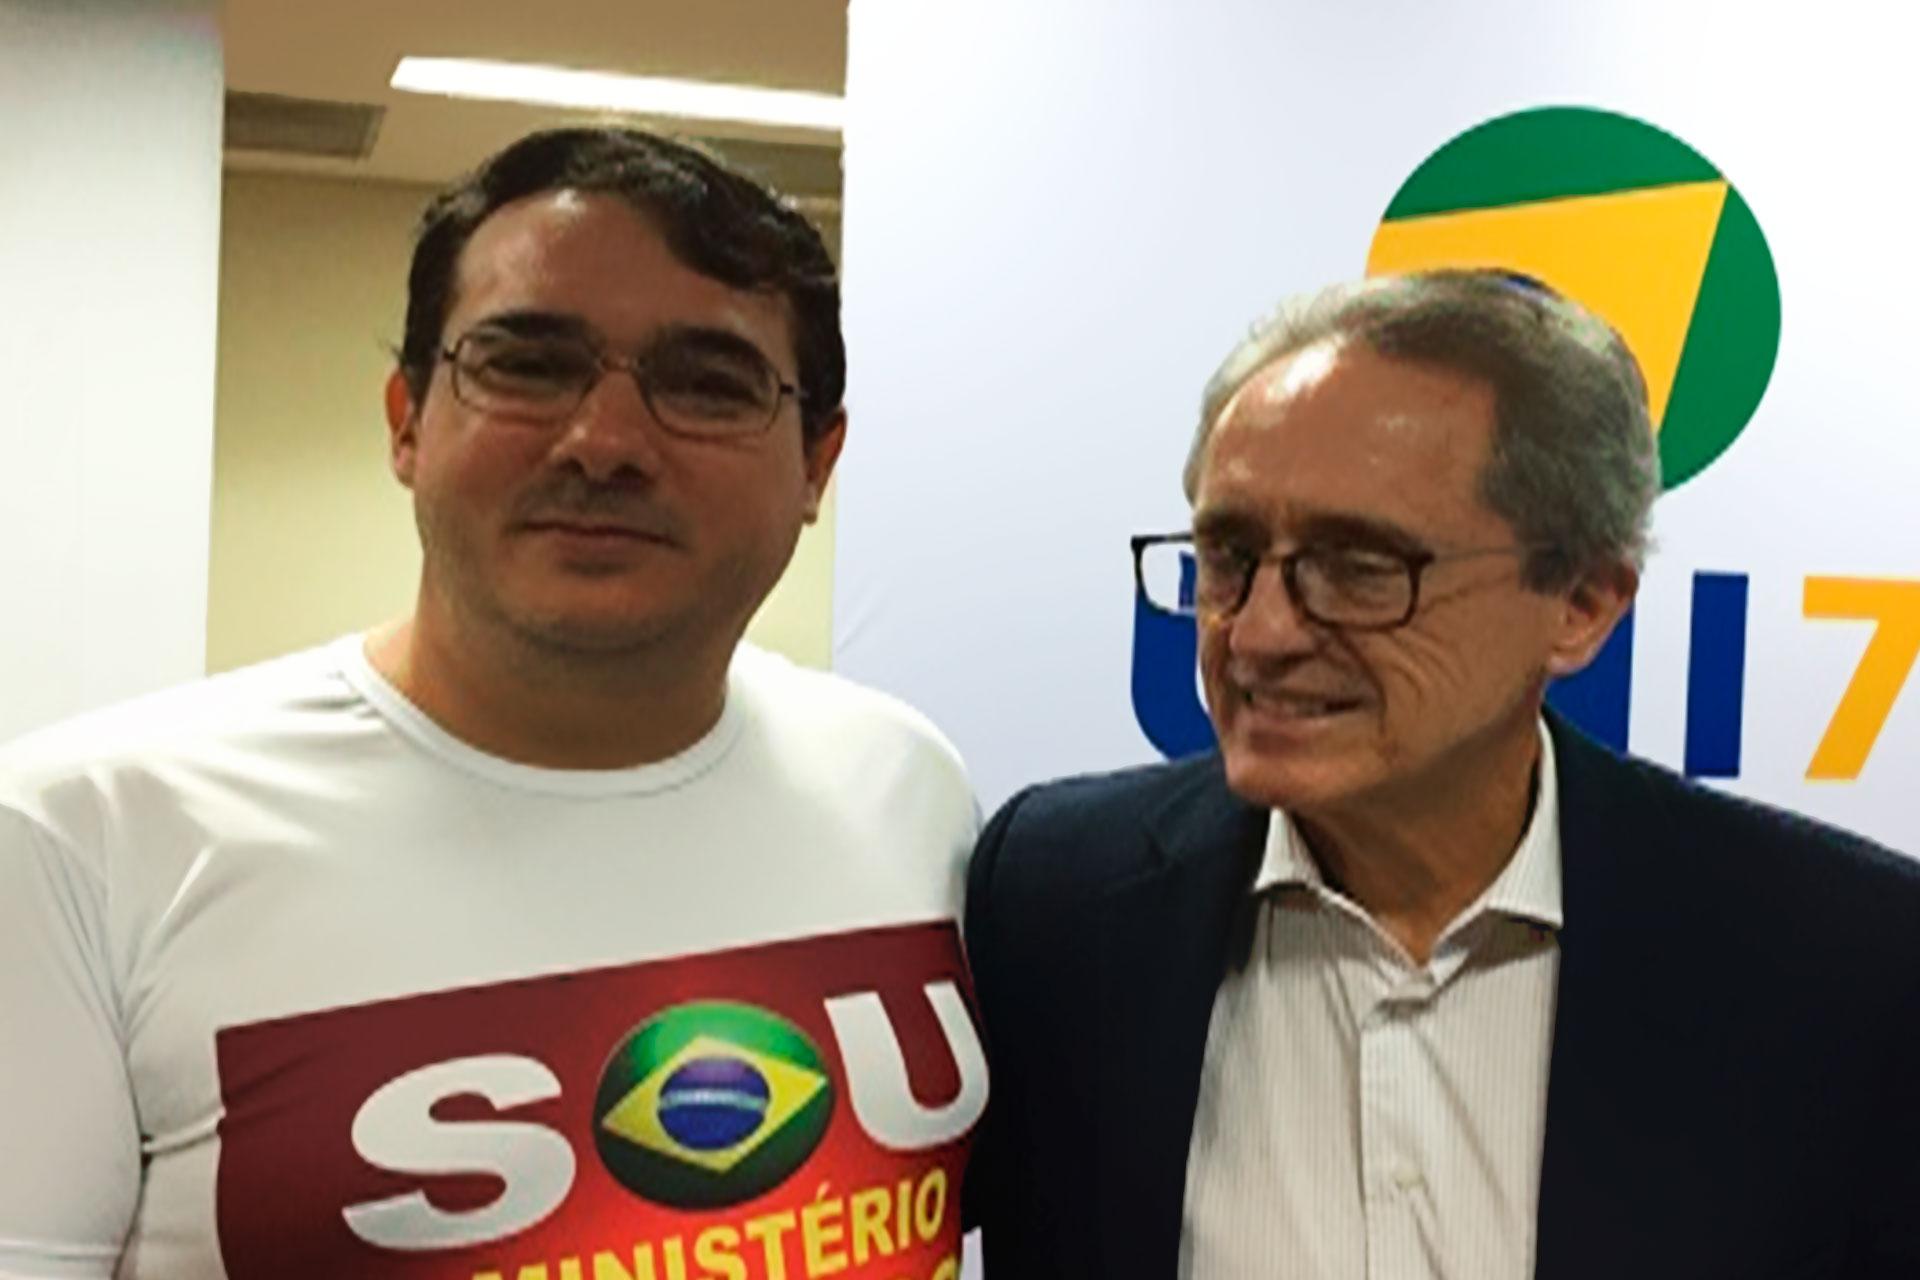 Juristas ratificam defesa intransigente da Democracia em Fortaleza